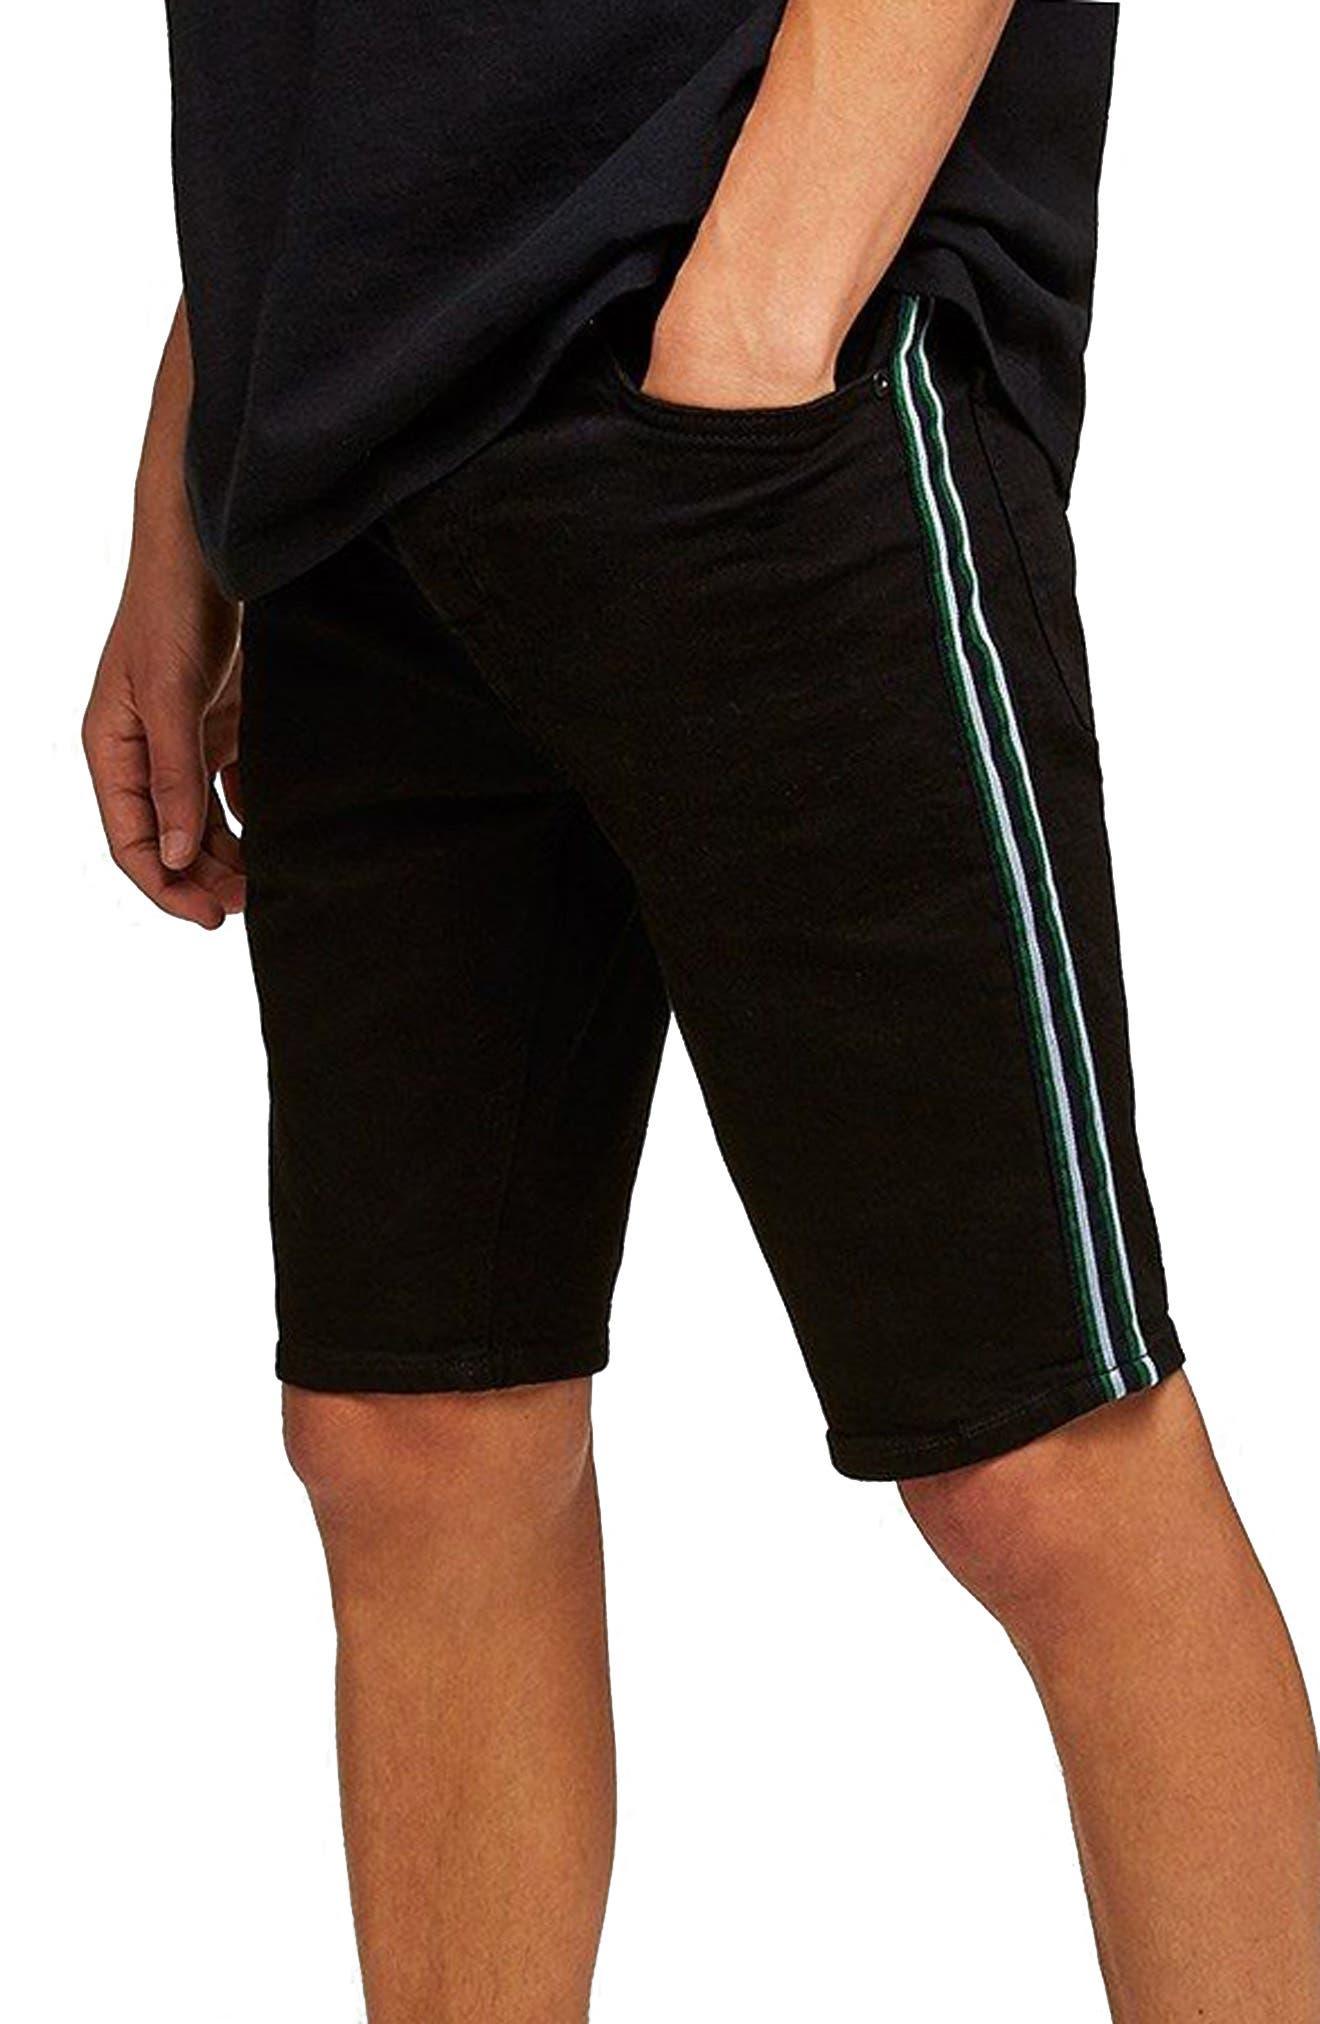 Tape Stretch Skinny Fit Denim Shorts,                             Main thumbnail 1, color,                             Black